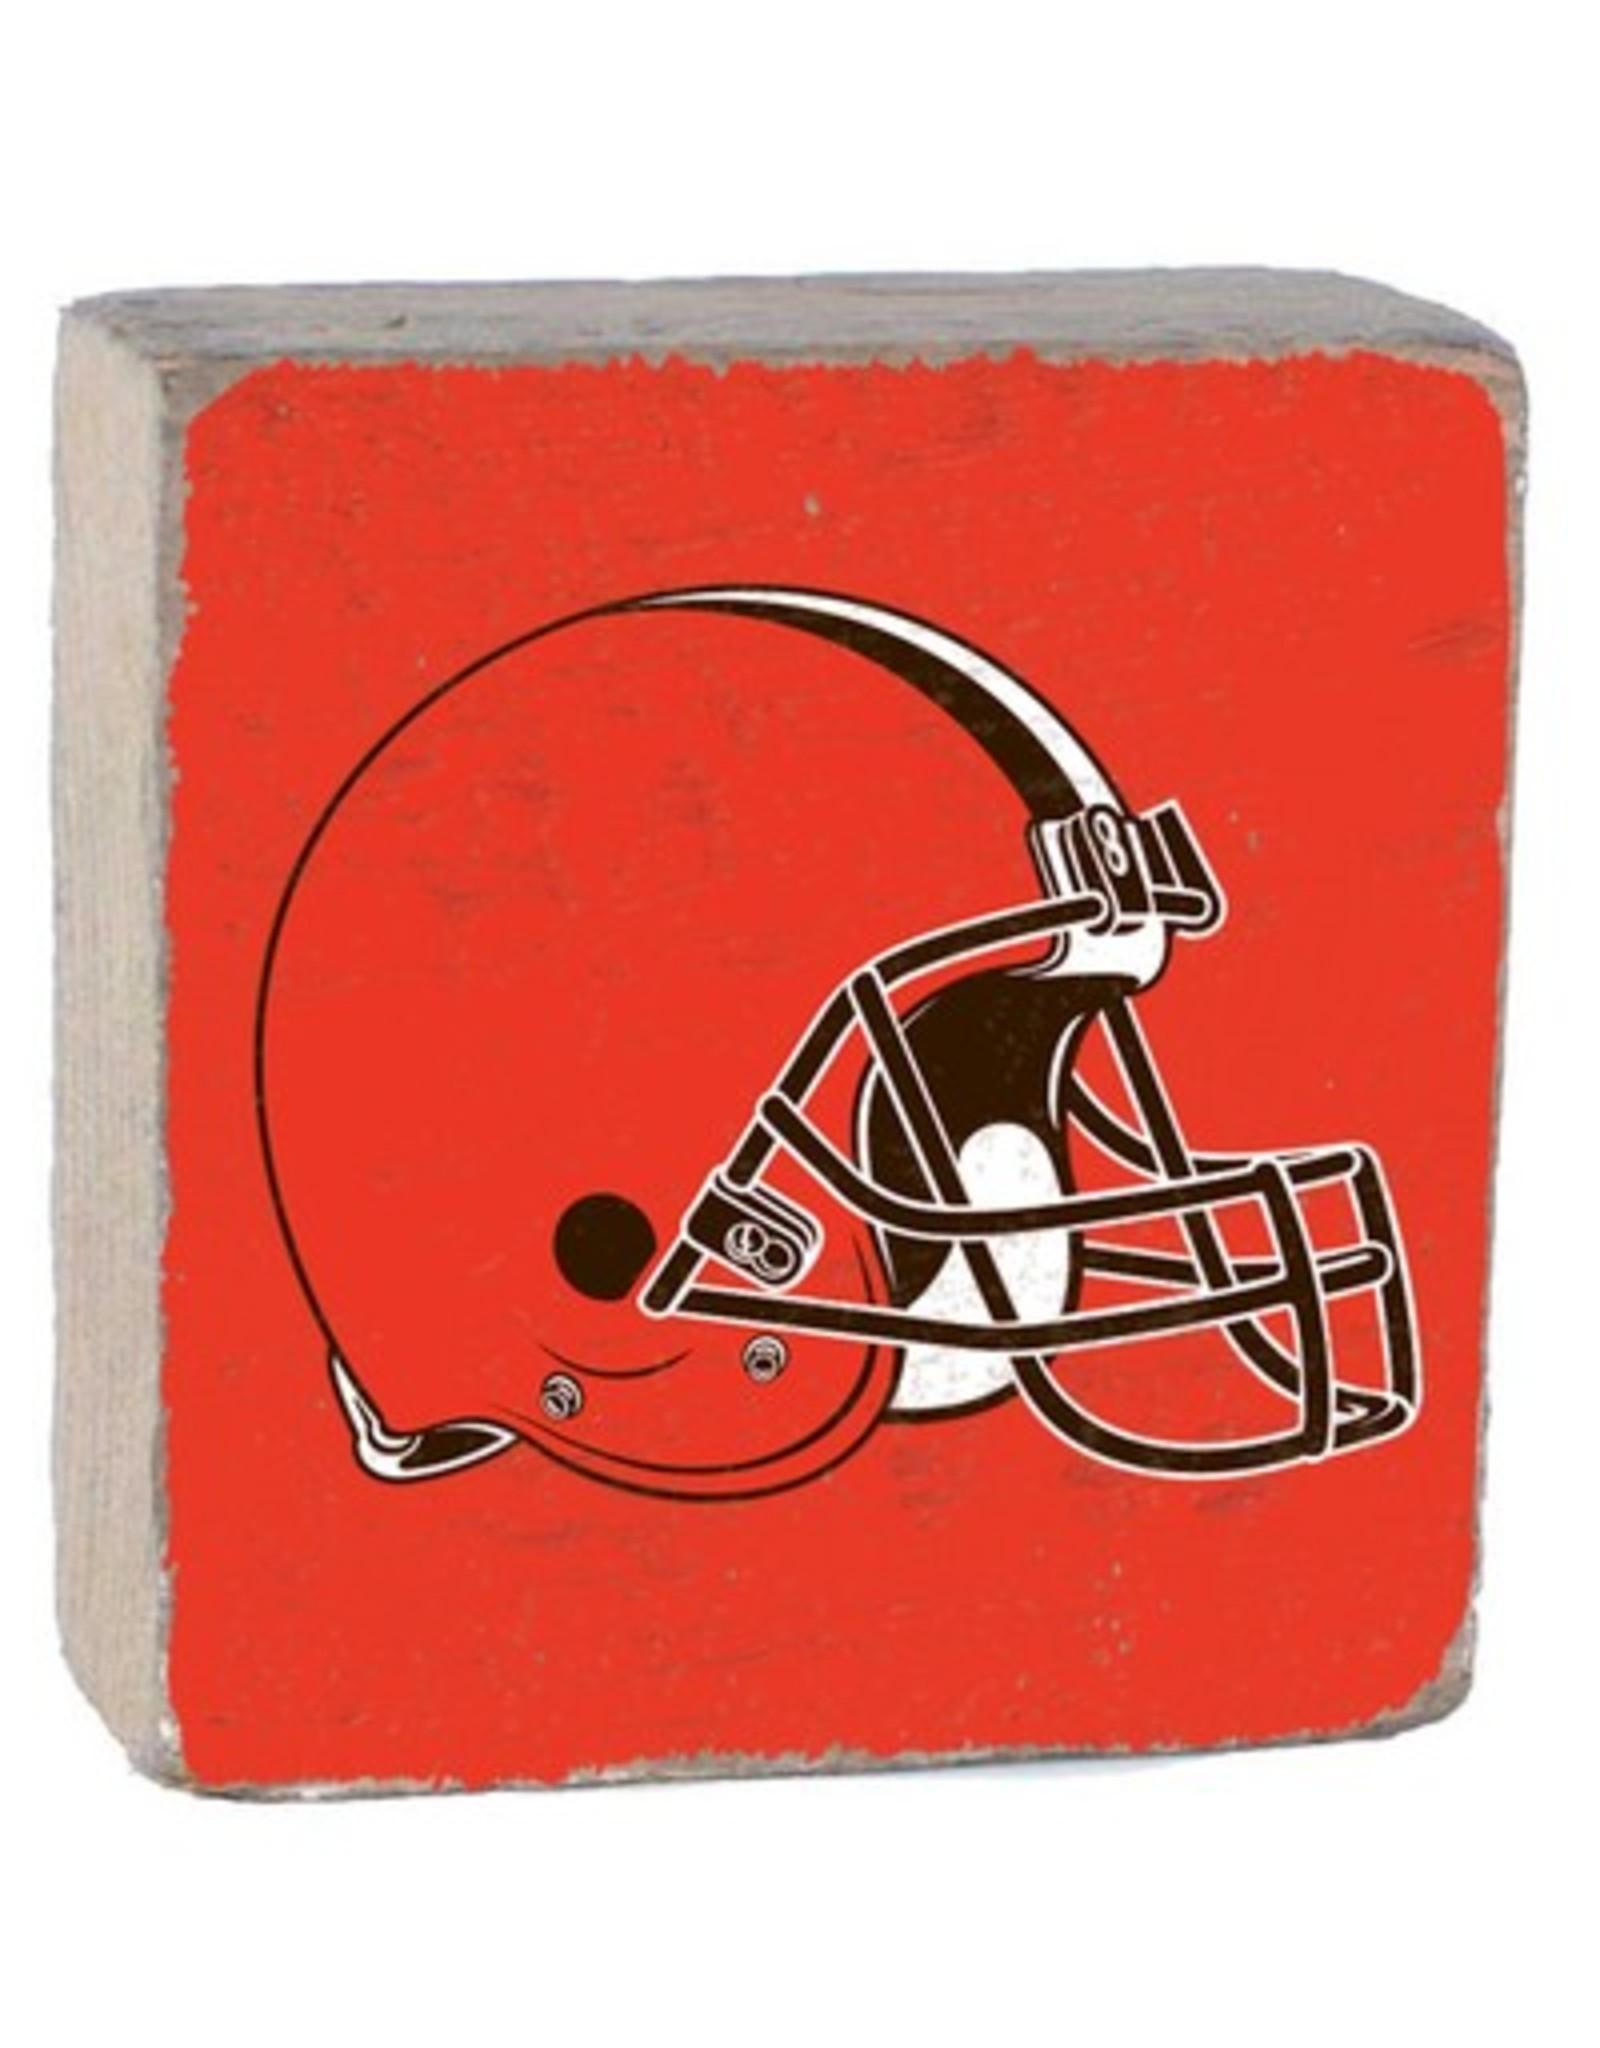 RUSTIC MARLIN Cleveland Browns Rustic Wood Team Block